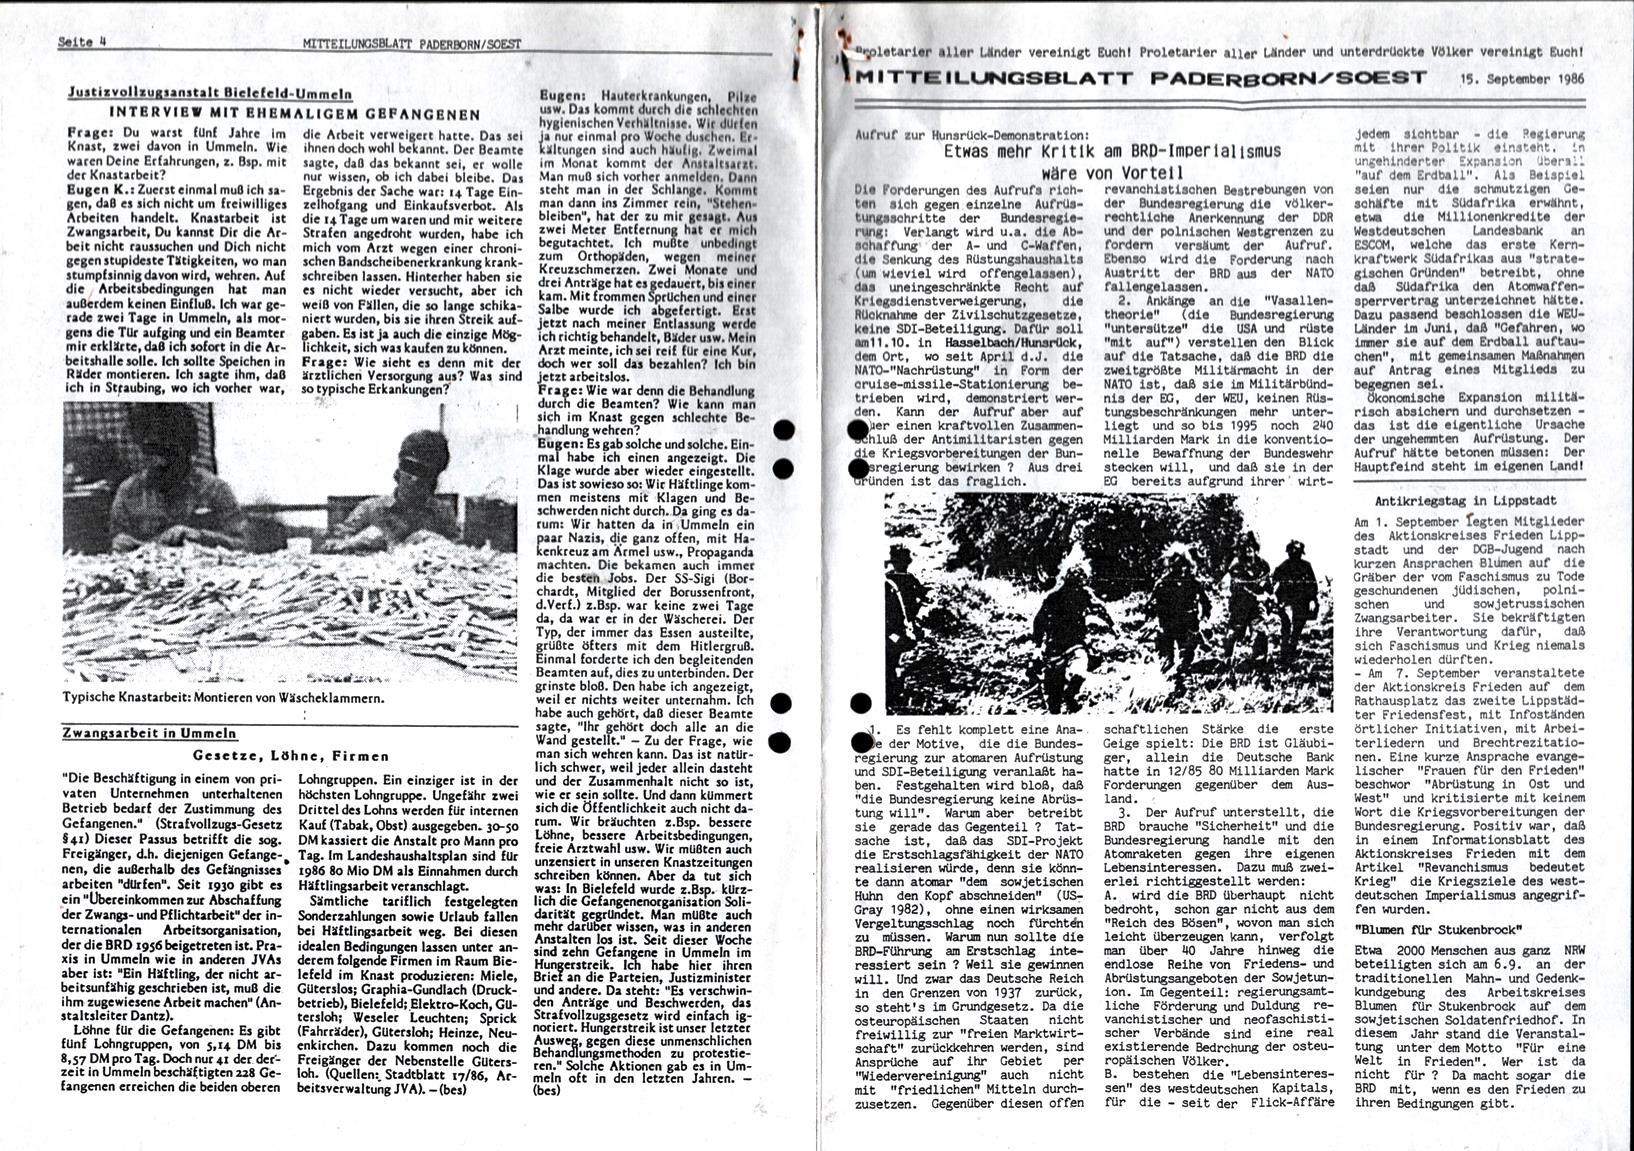 Paderborn_BWK_Mitteilungsblatt_19860915_001